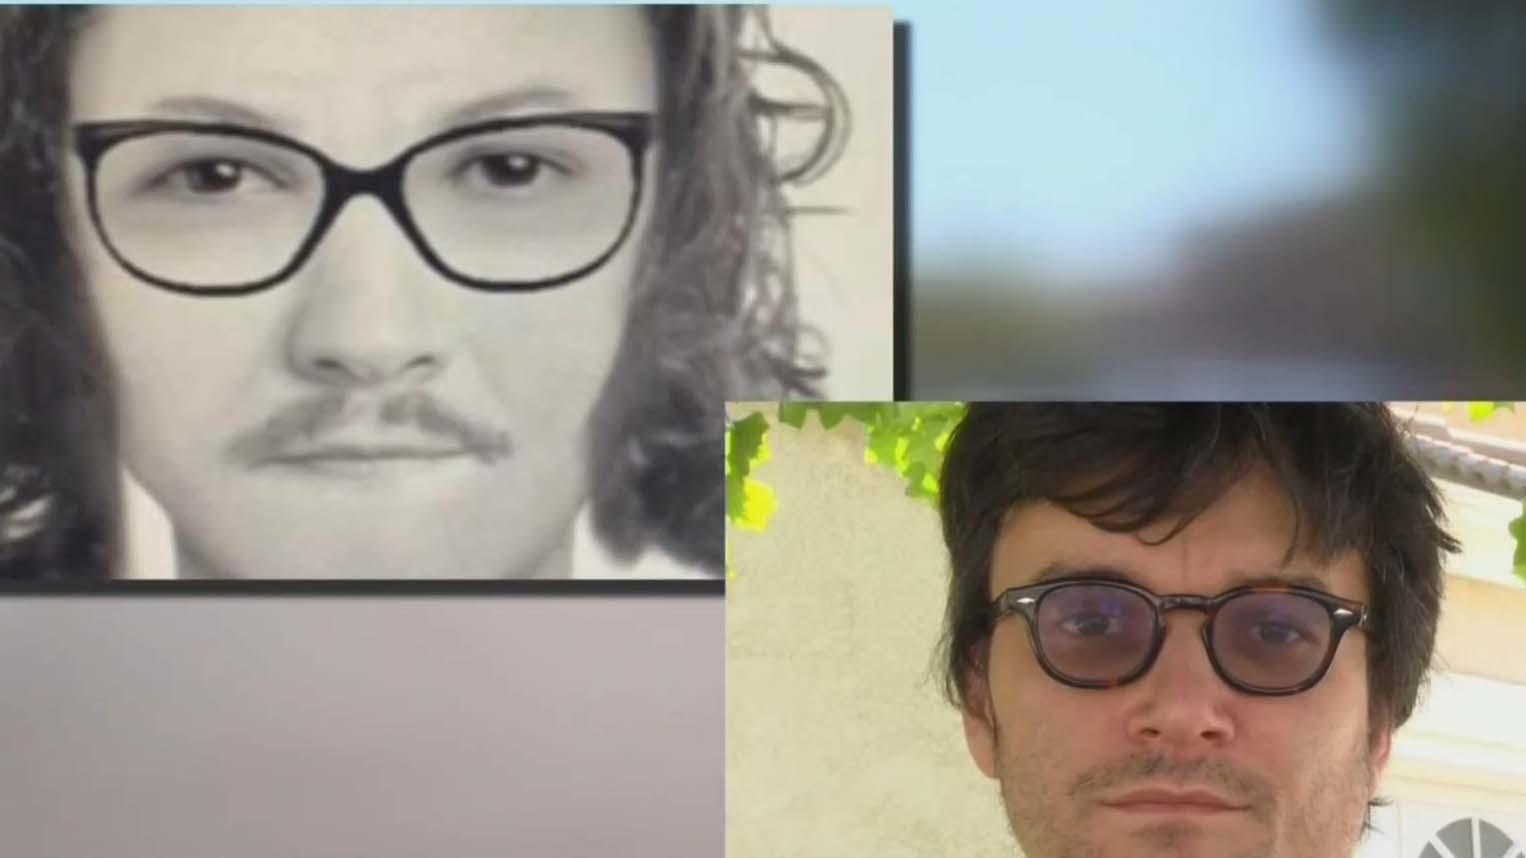 Man Mistaken for Police Sketch of Predator Gets Beaten Up